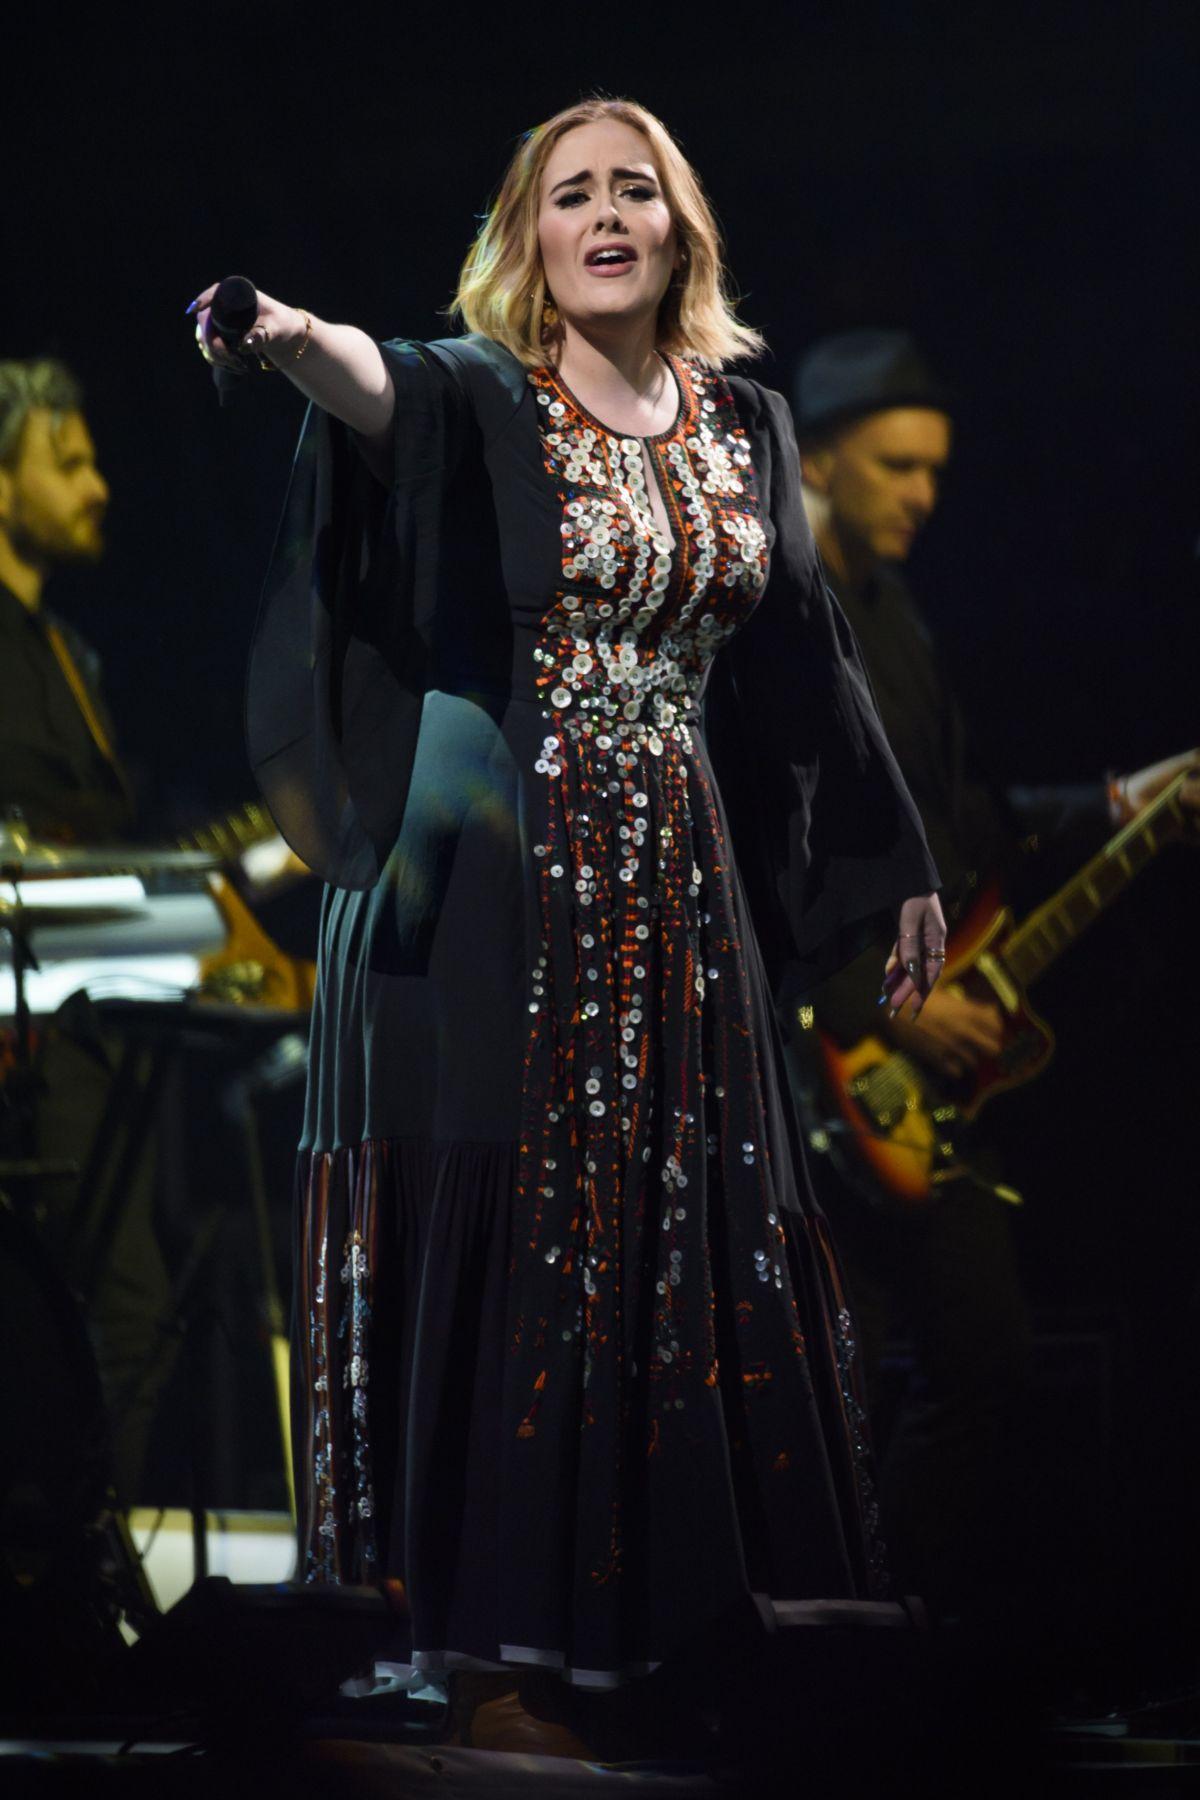 Adele Tour: 25 Singer Announces European Live Shows For